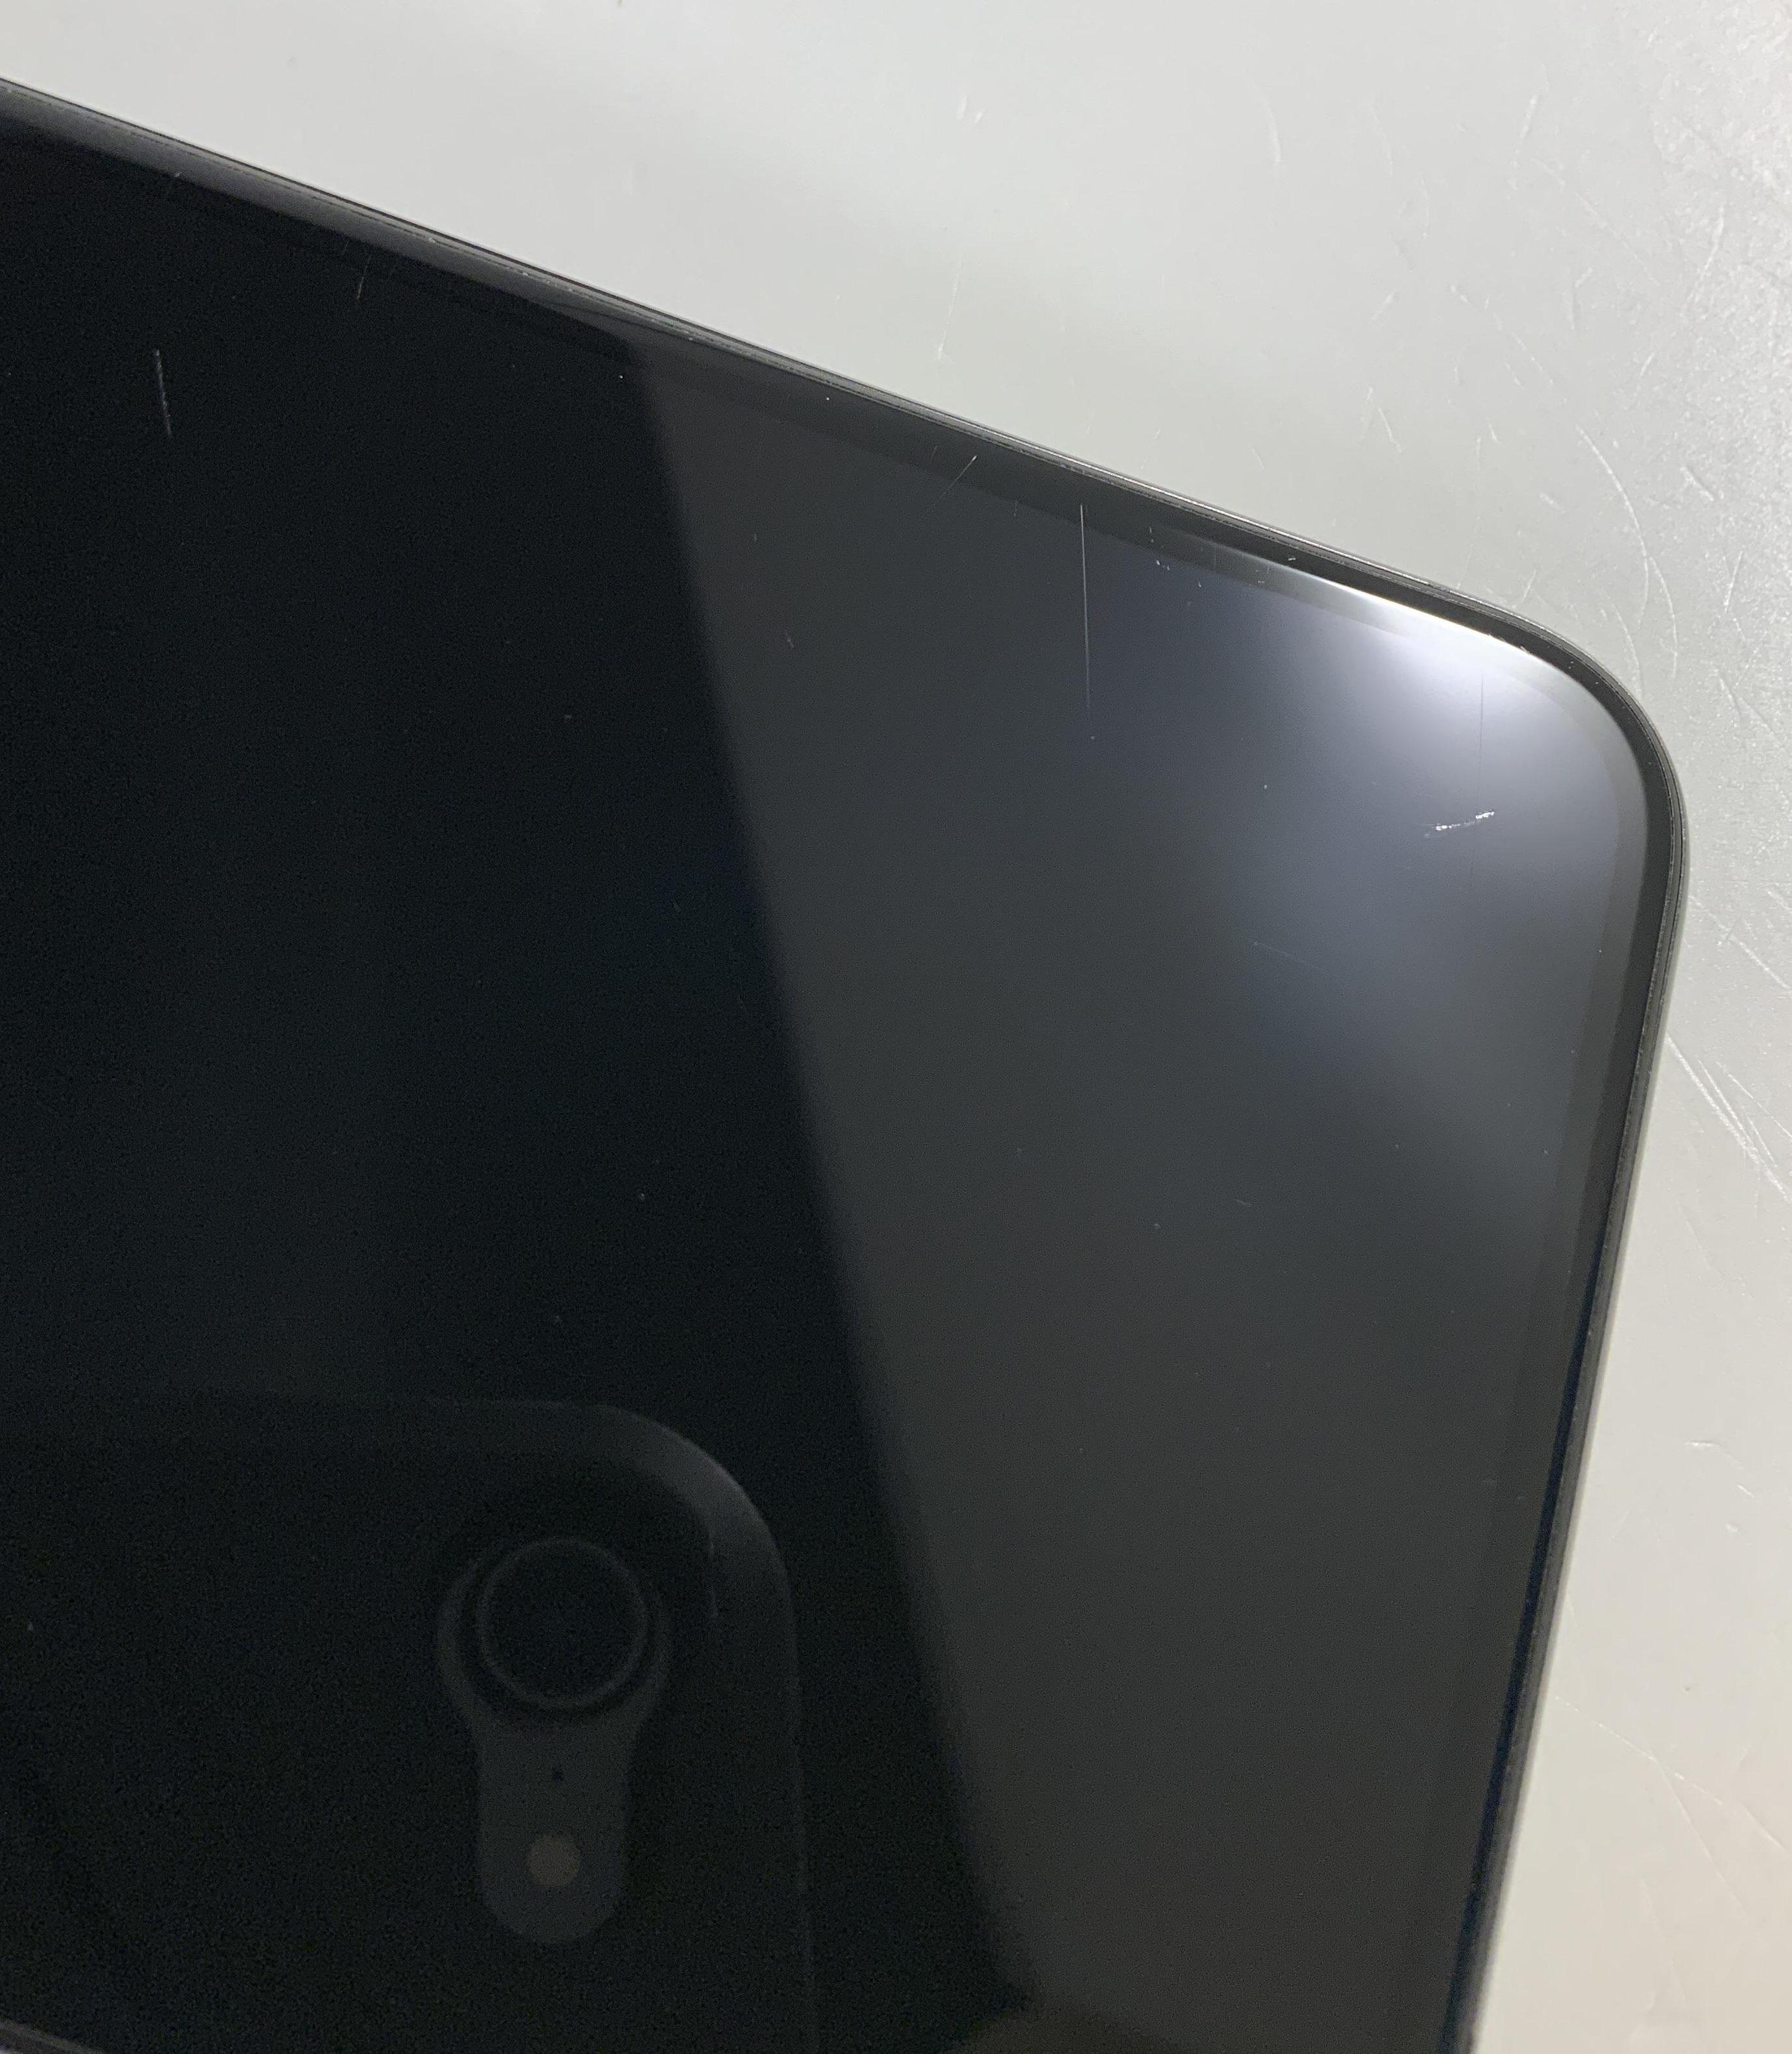 iPhone 11 Pro 256GB, 256GB, Space Gray, obraz 5